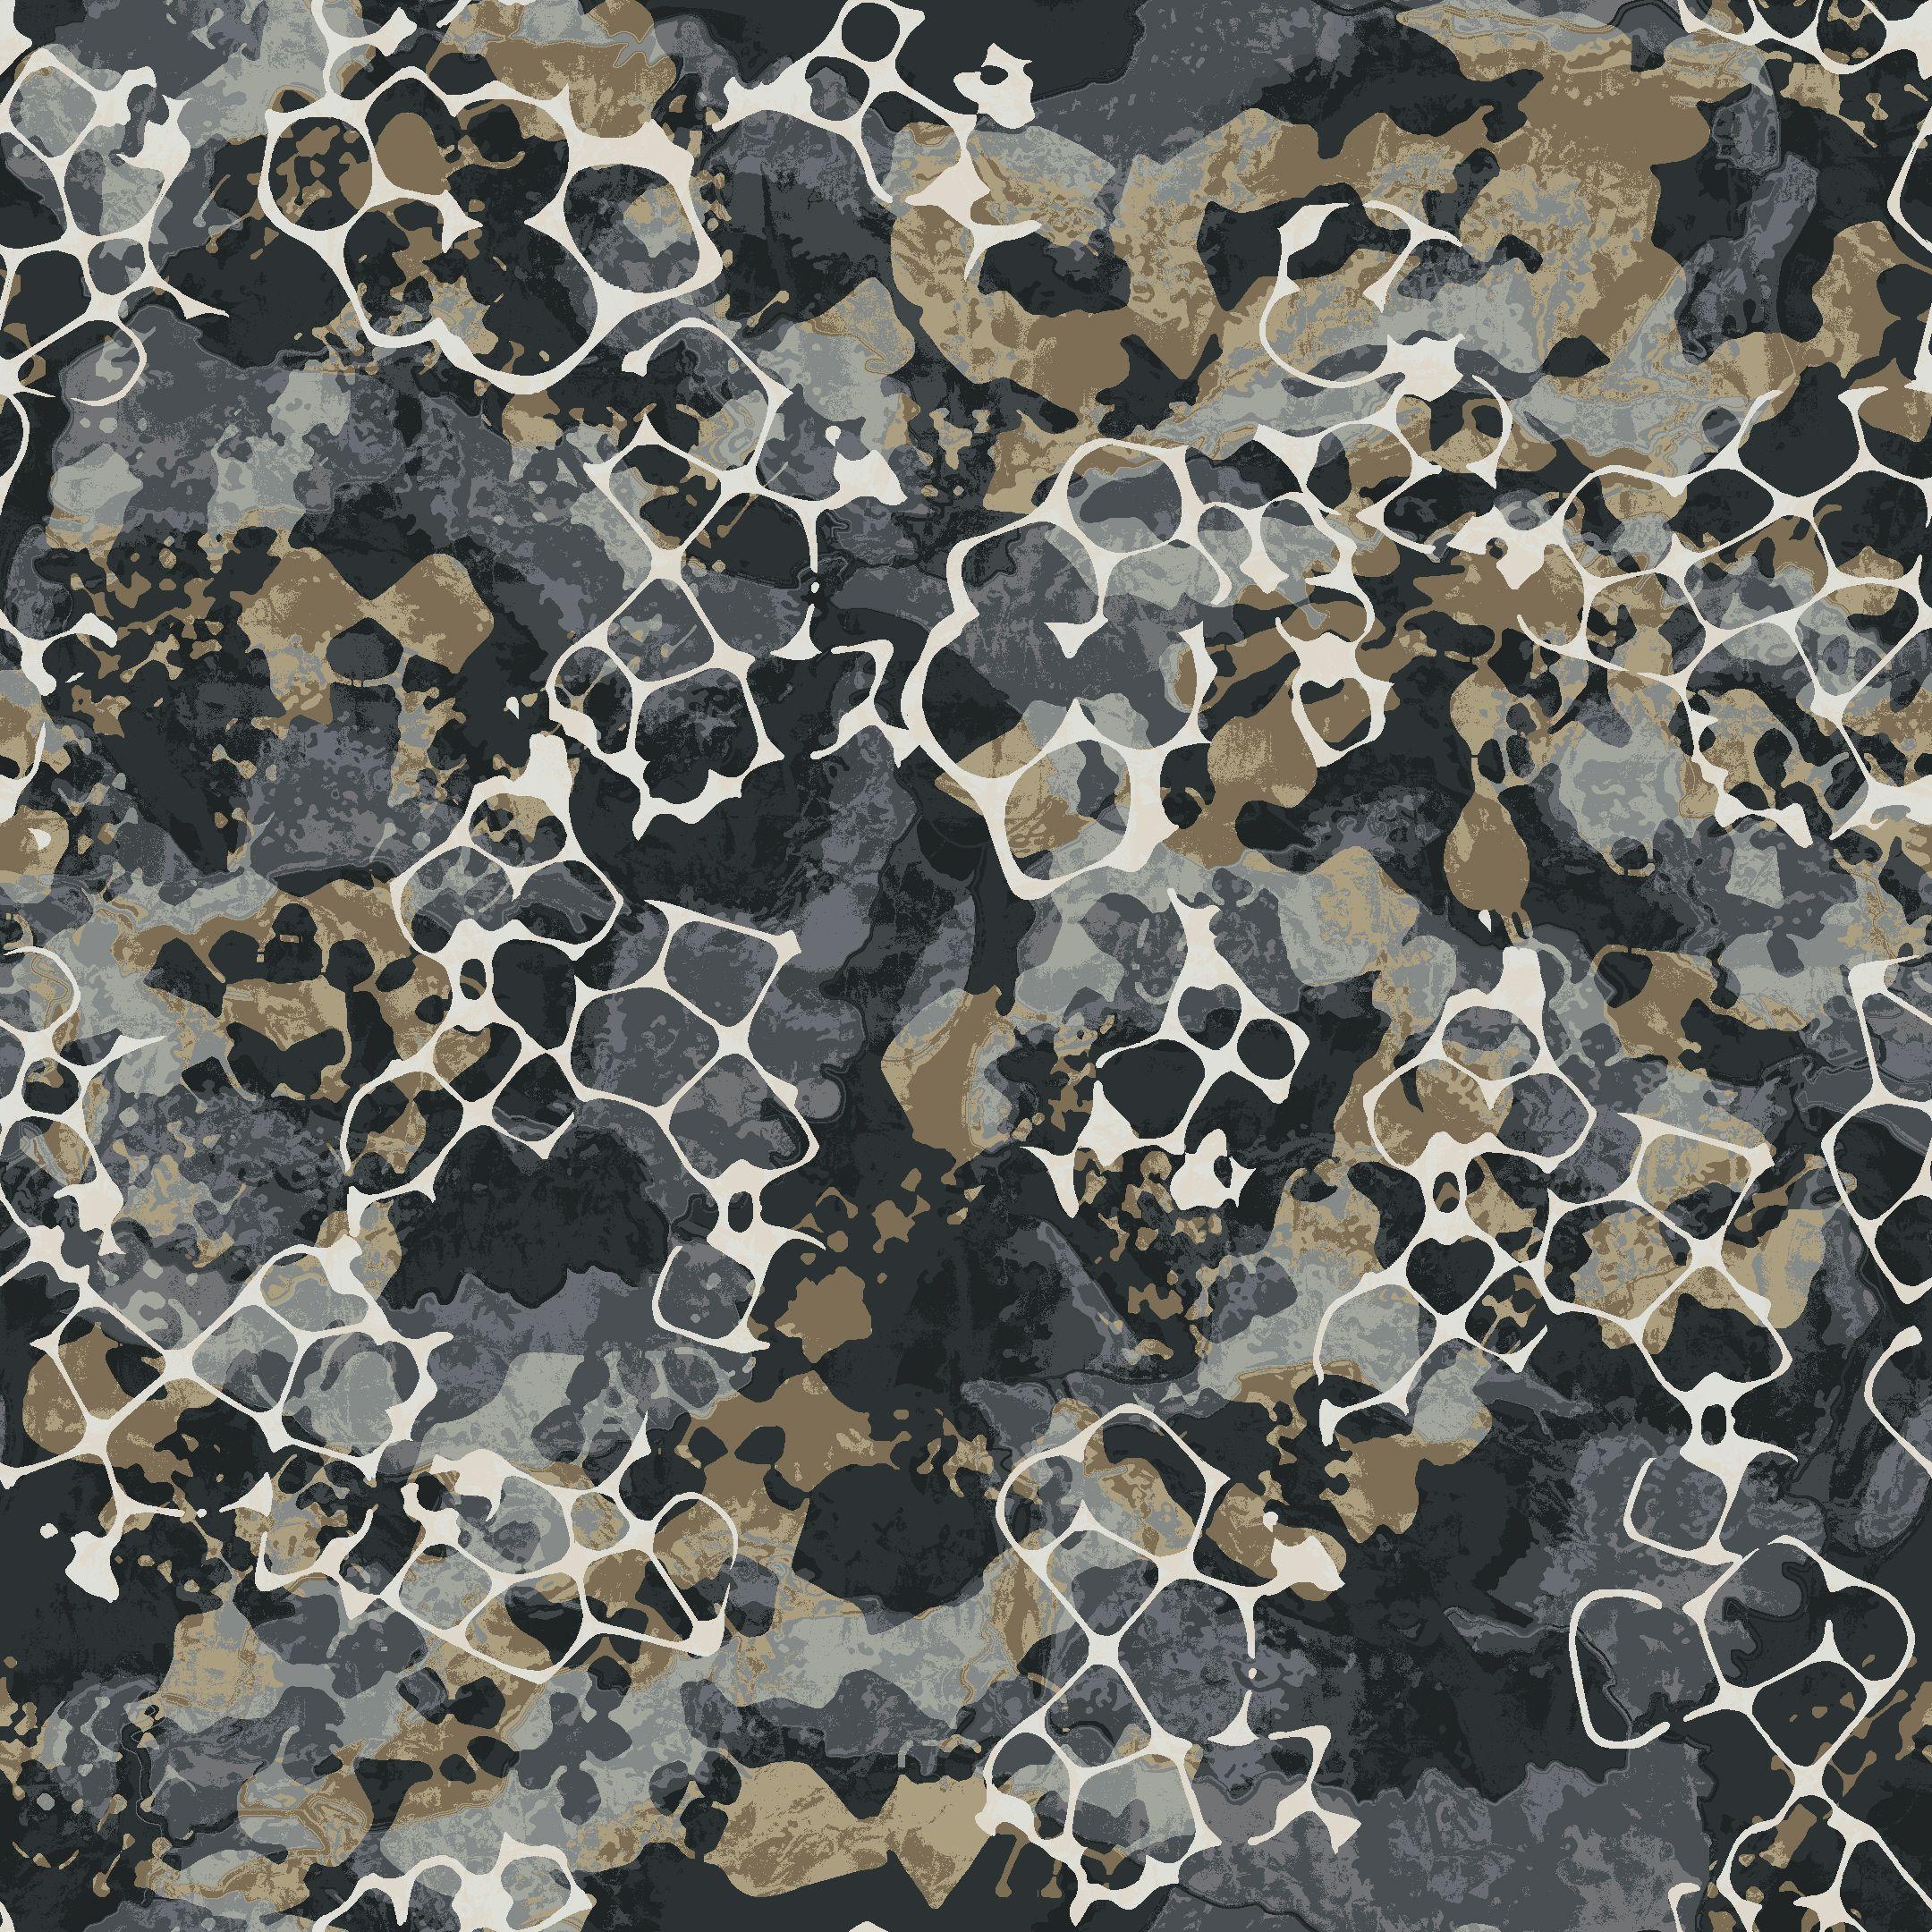 carpet 15 x 15. qtw43658 15\u0027w x 15\u0027l #durkan #hospitalitydesign #products #carpet carpet 15